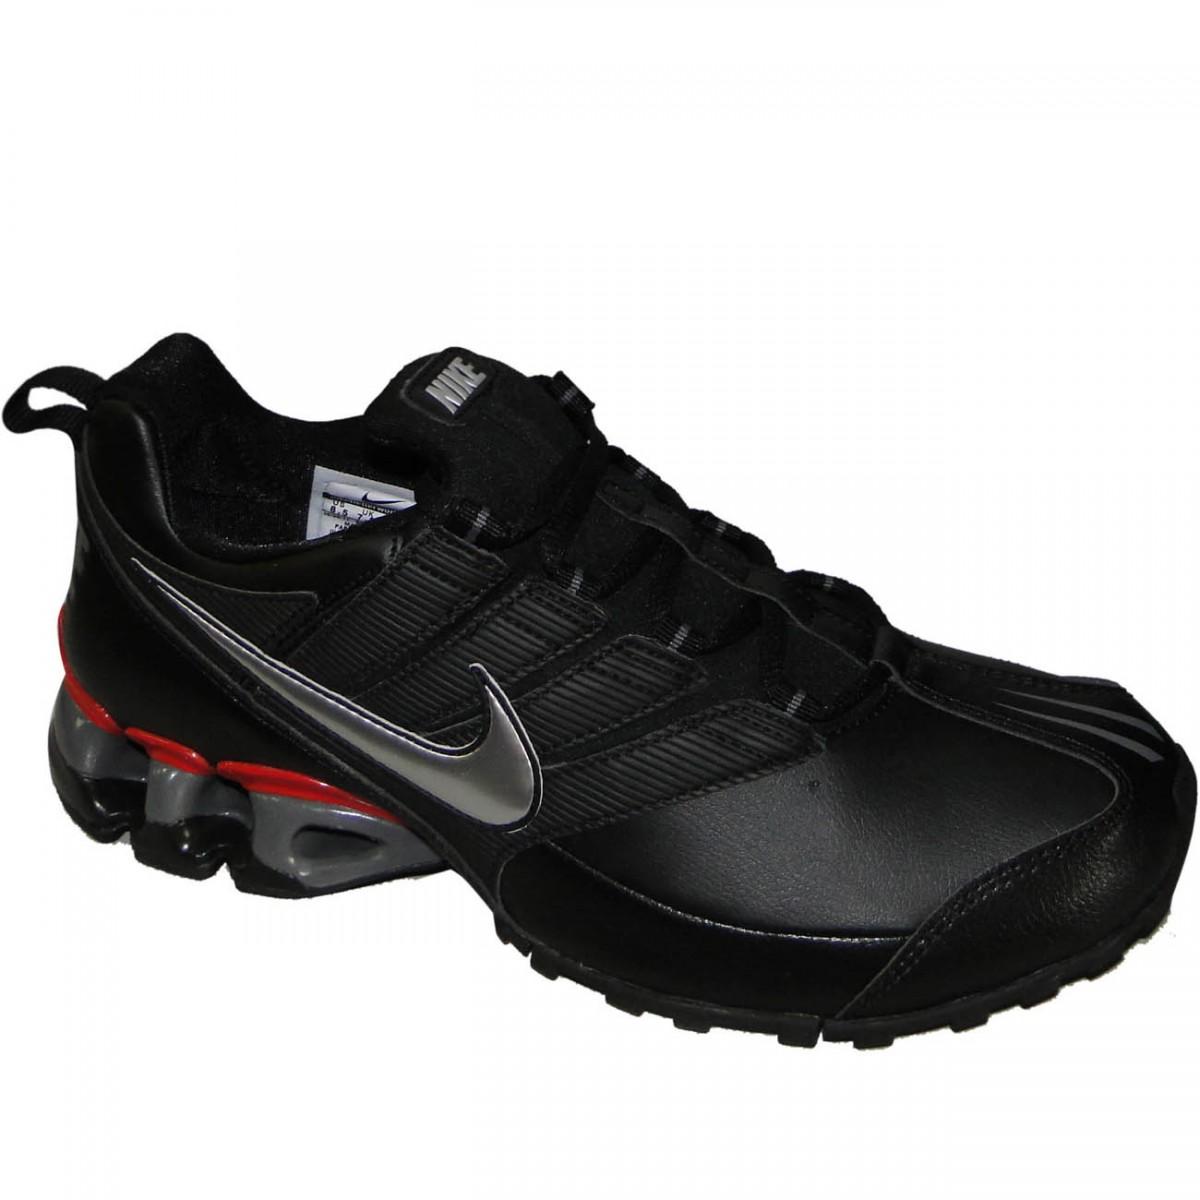 81f50df8fb8 Tenis Nike Impax Related Keywords   Suggestions - Tenis Nike Impax ...